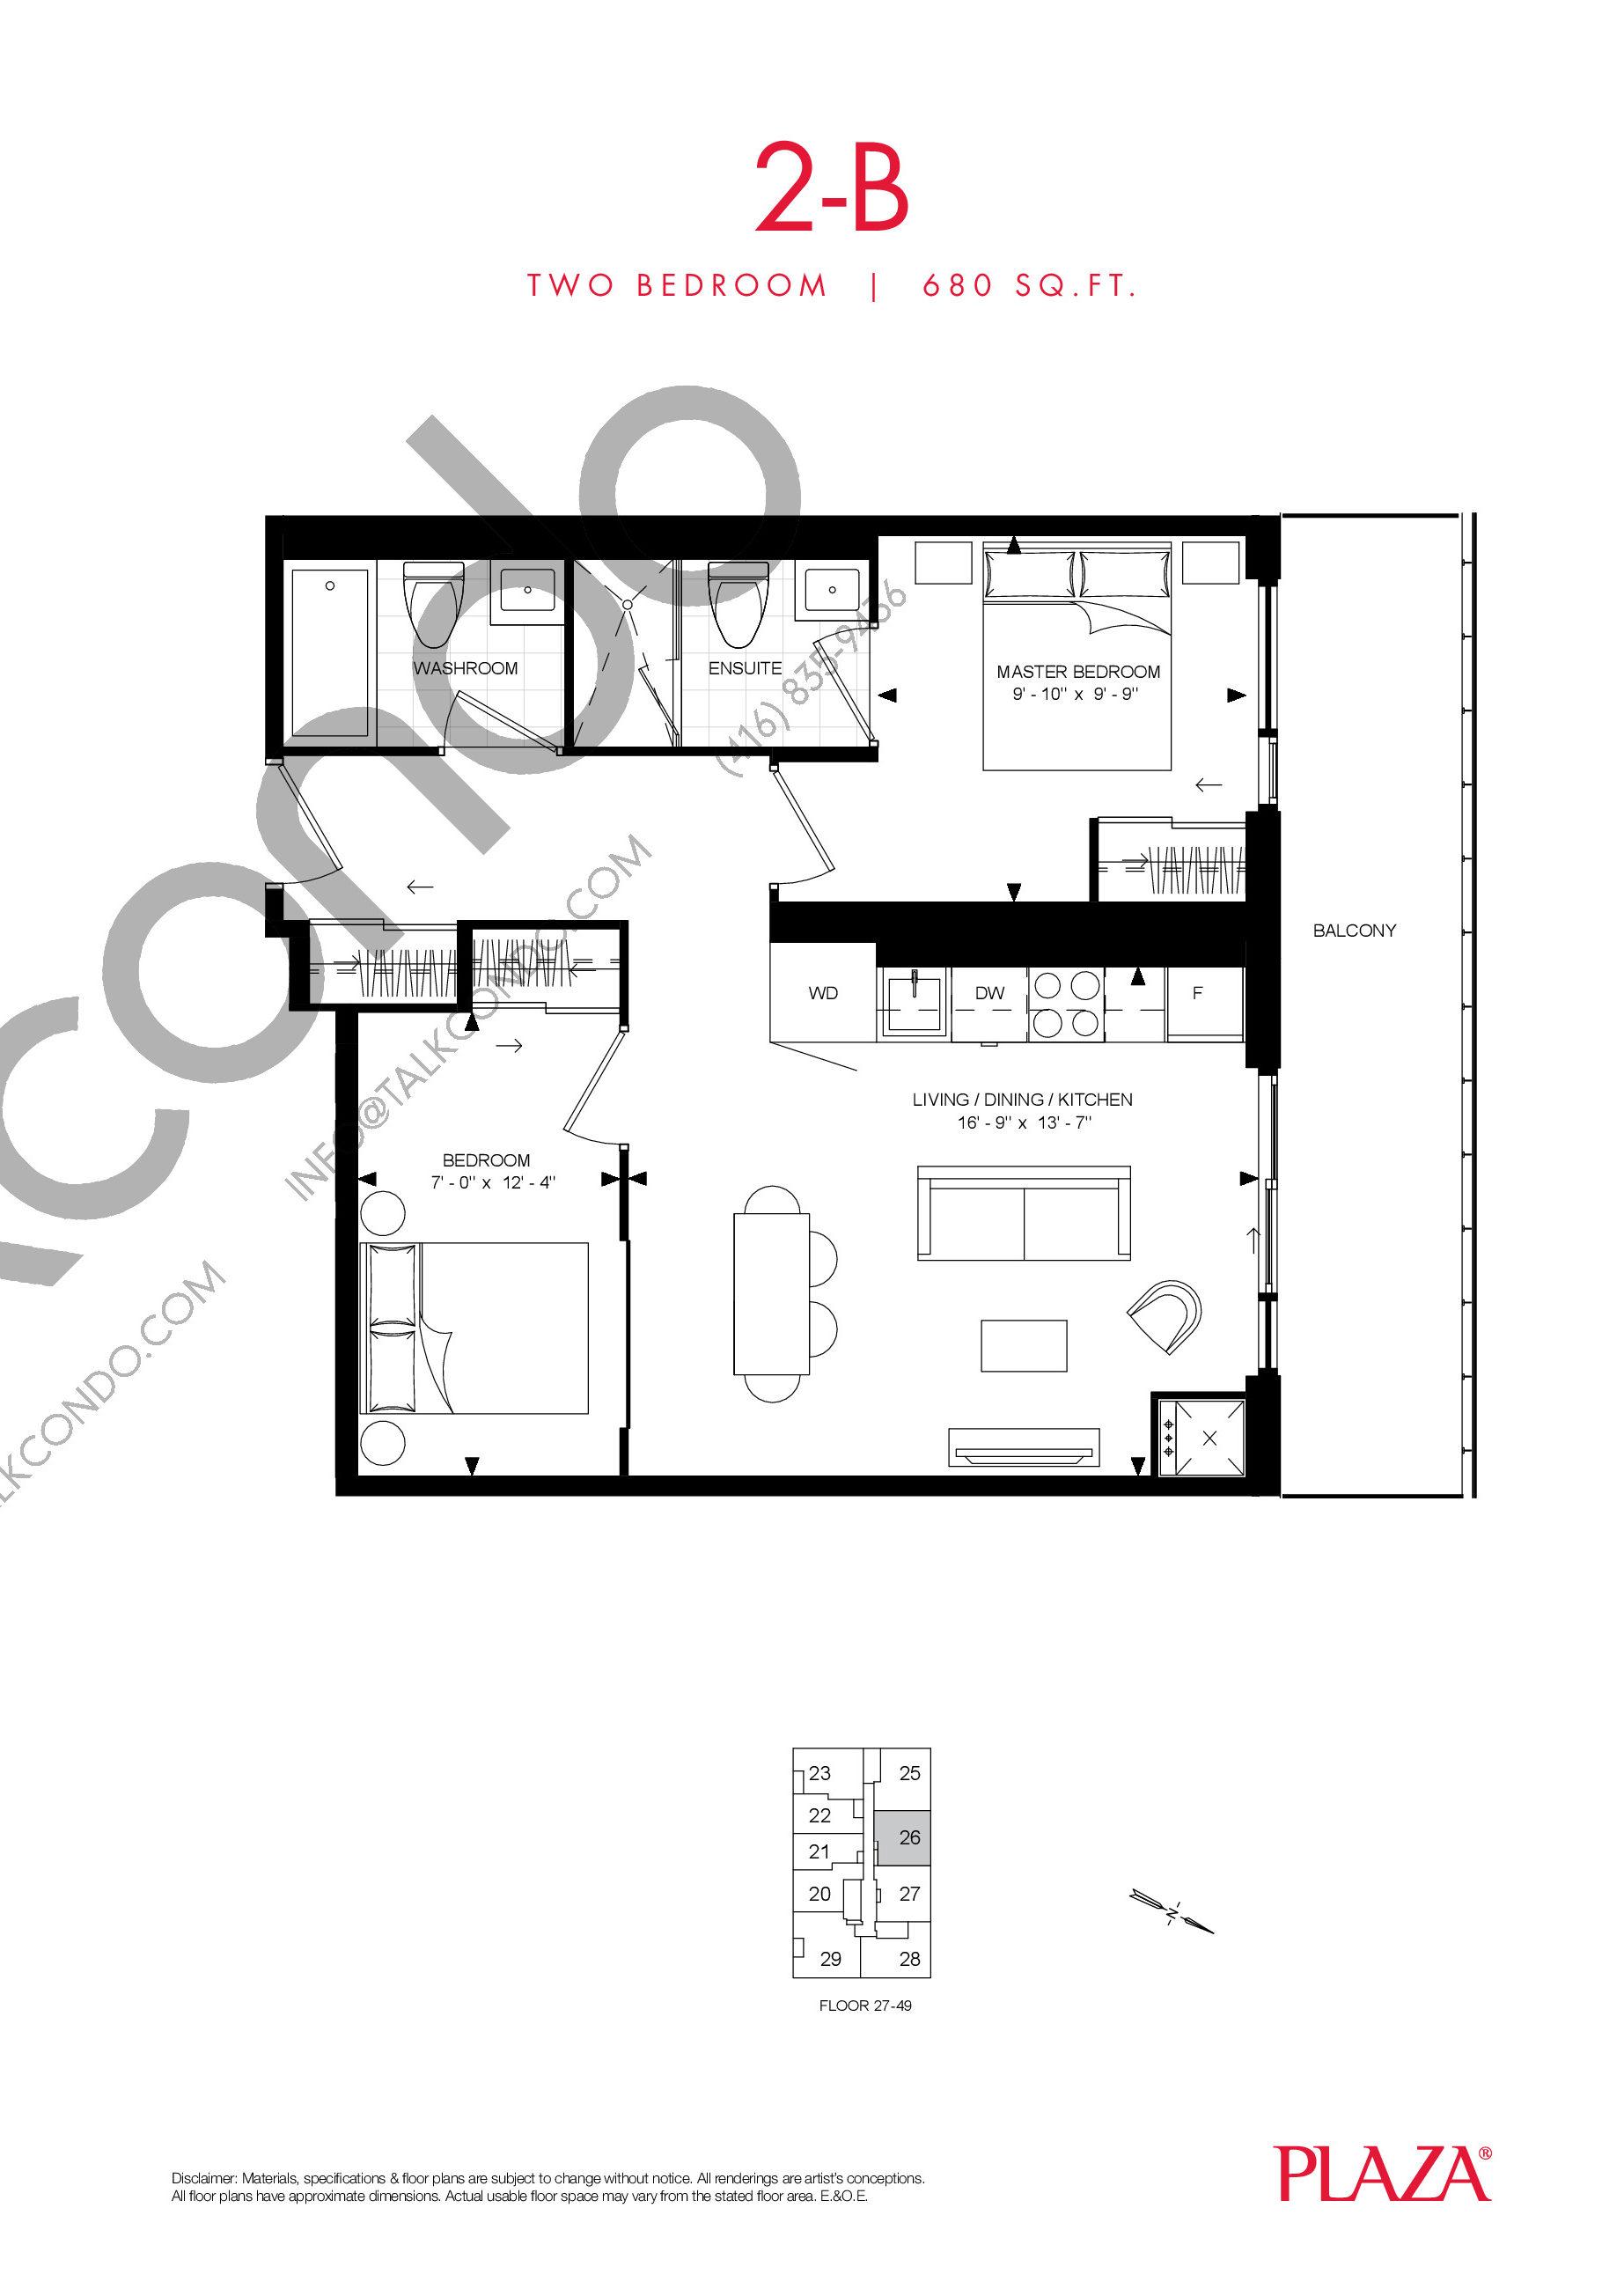 2-B Floor Plan at Encore Theatre District Condos - 680 sq.ft